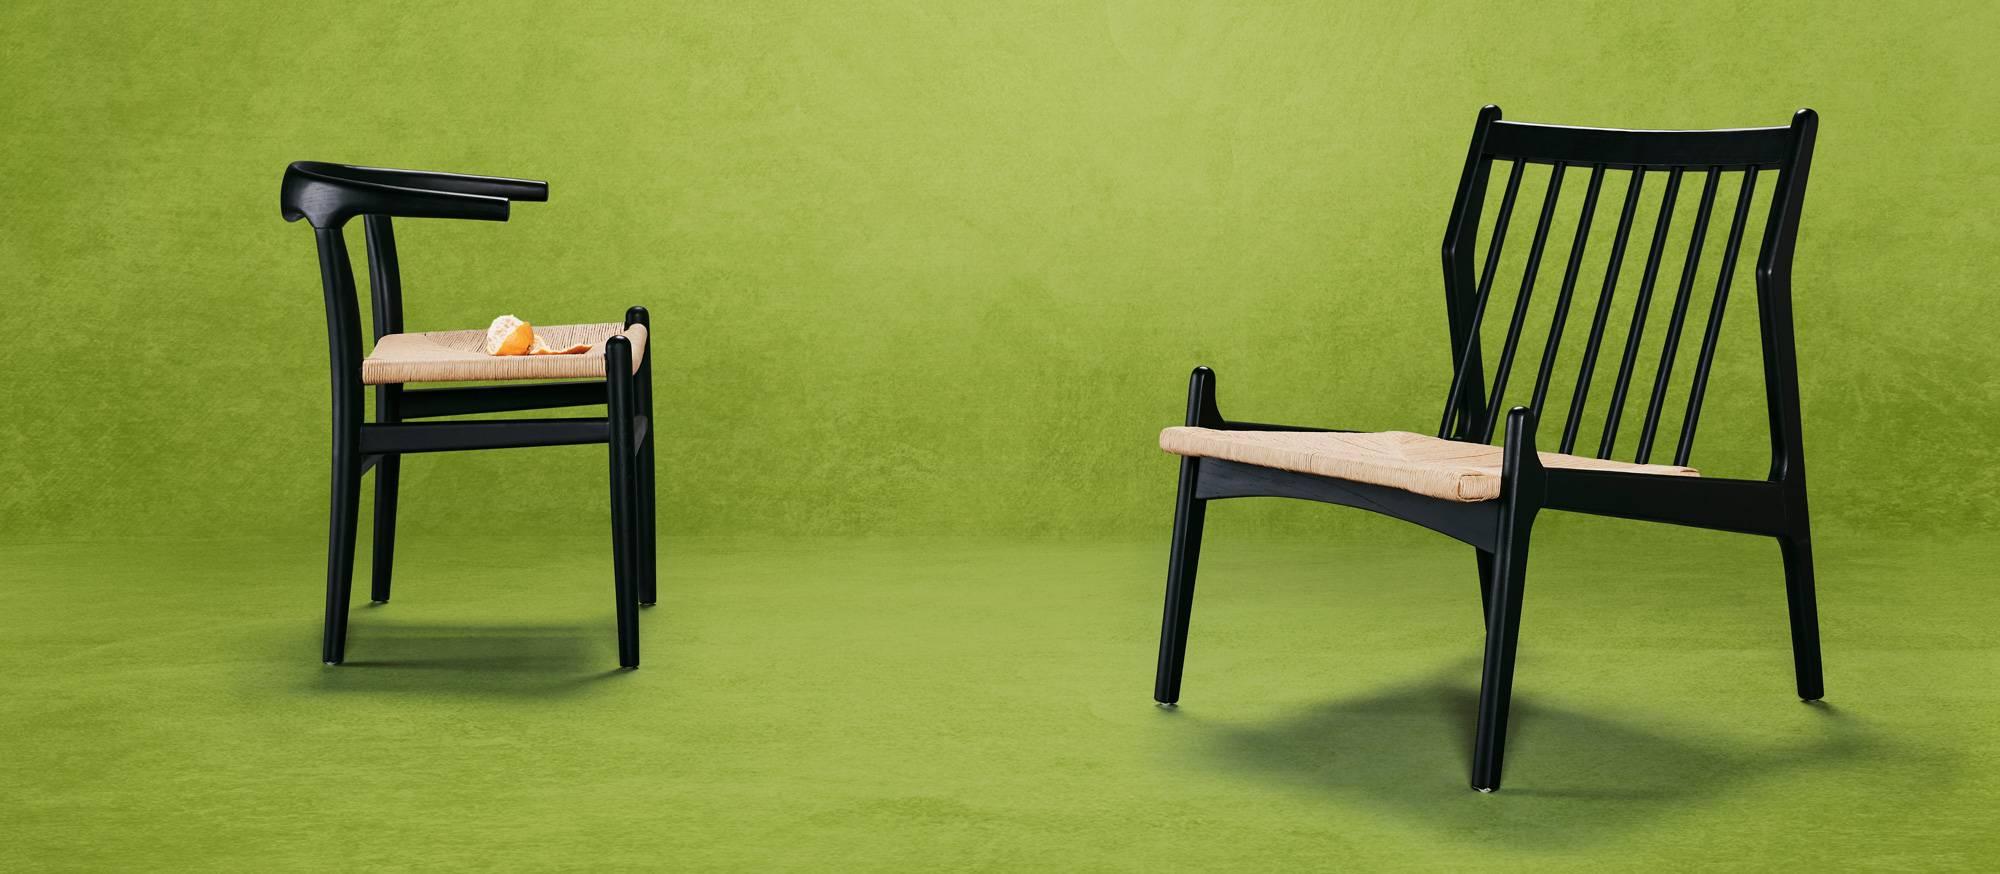 josefssons postorder möbler